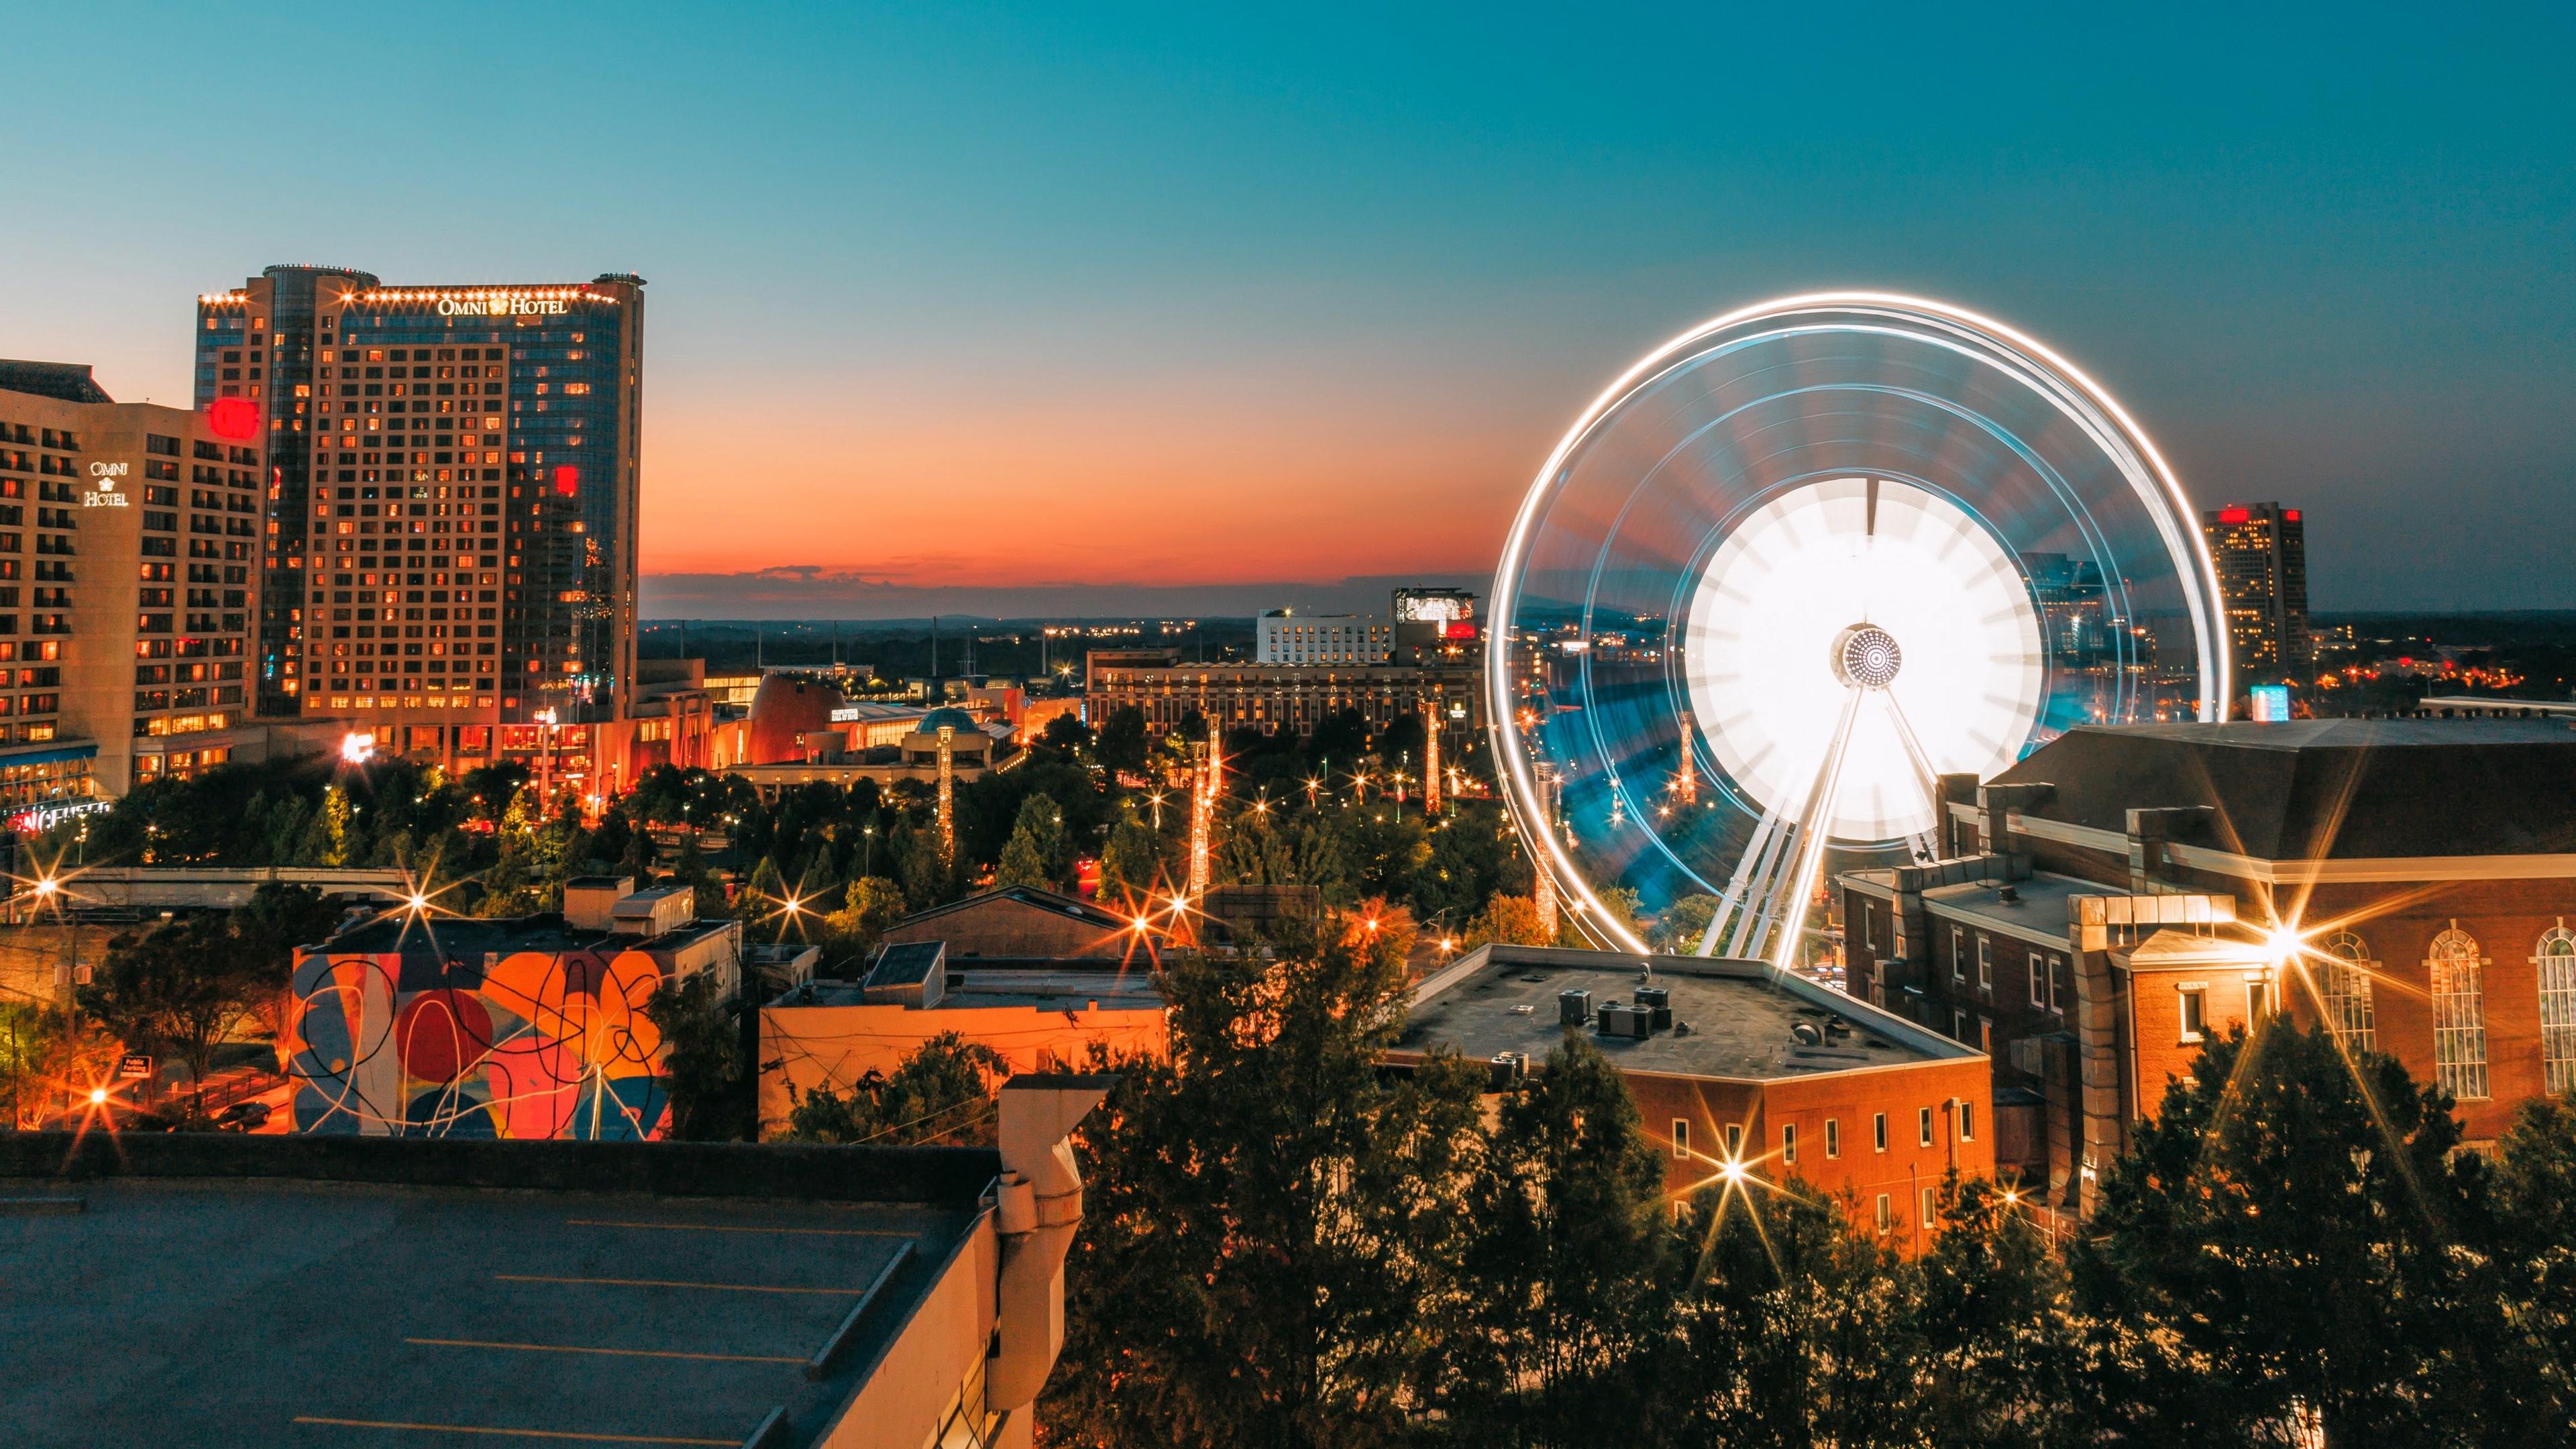 ferris wheel night city buildings 4k 1538066179 - ferris wheel, night, city, buildings 4k - Night, ferris wheel, City